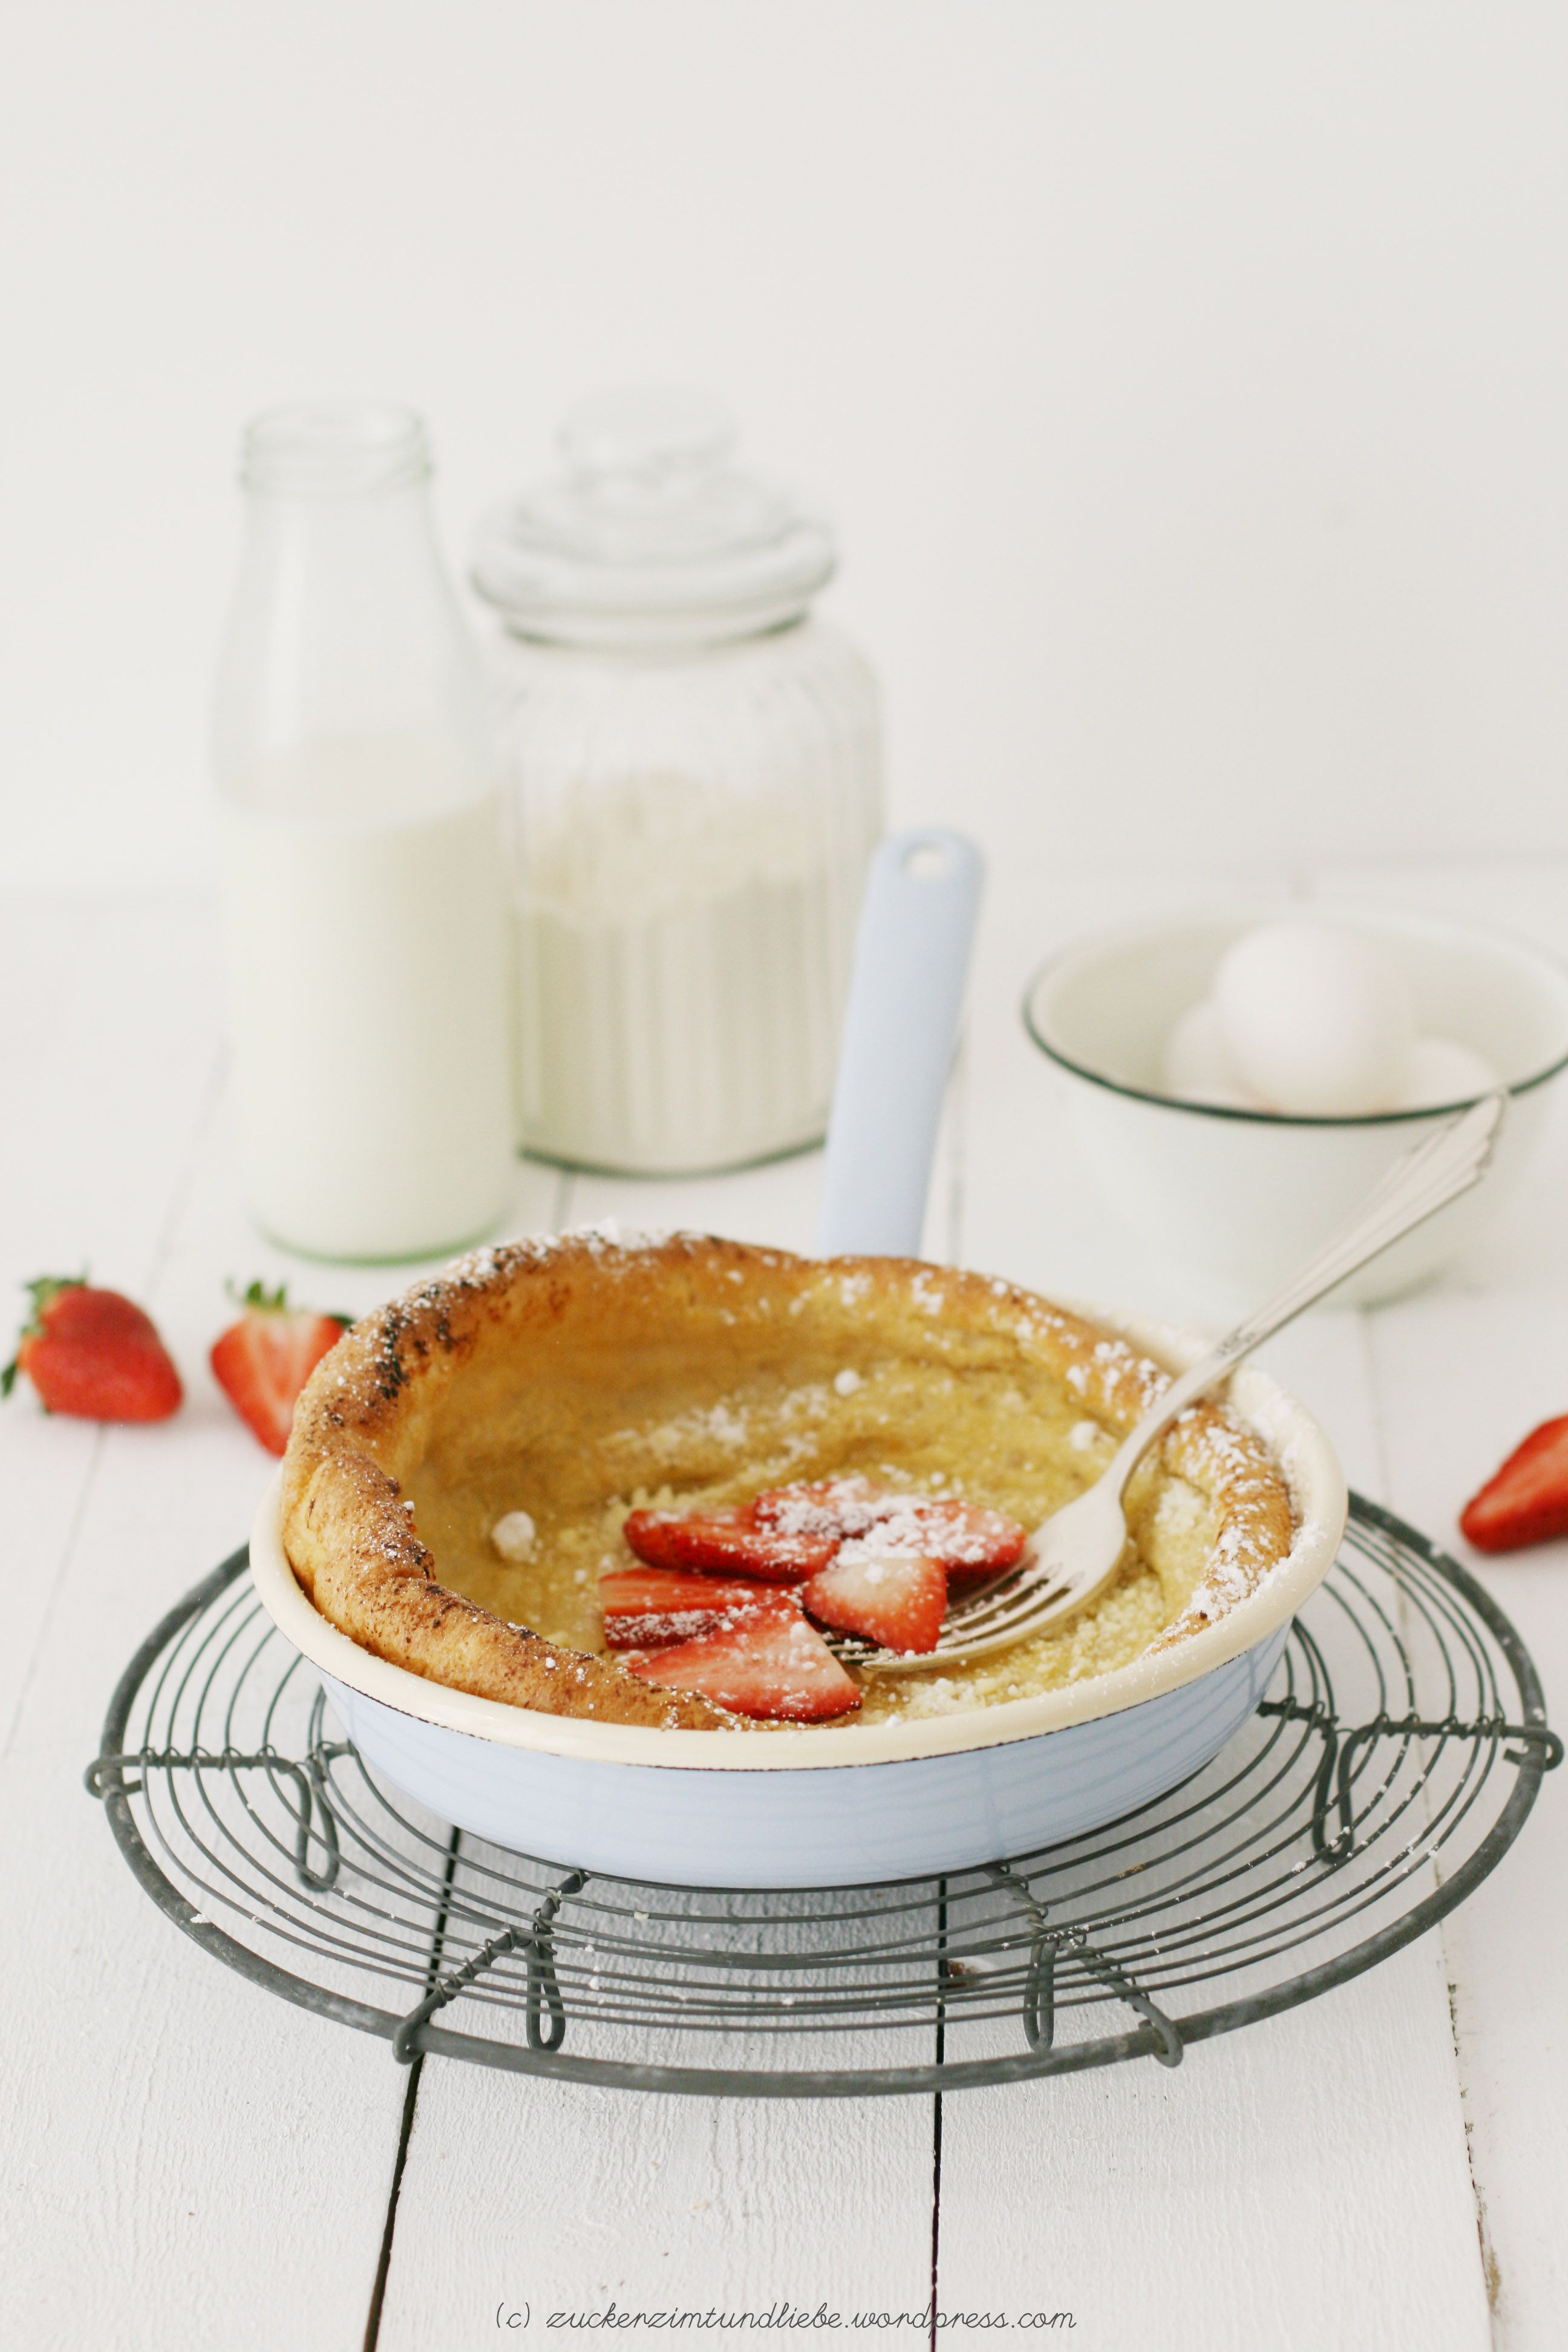 Puffed Pancake Rezept Dutch Babe mit Erdbeeren Recipe